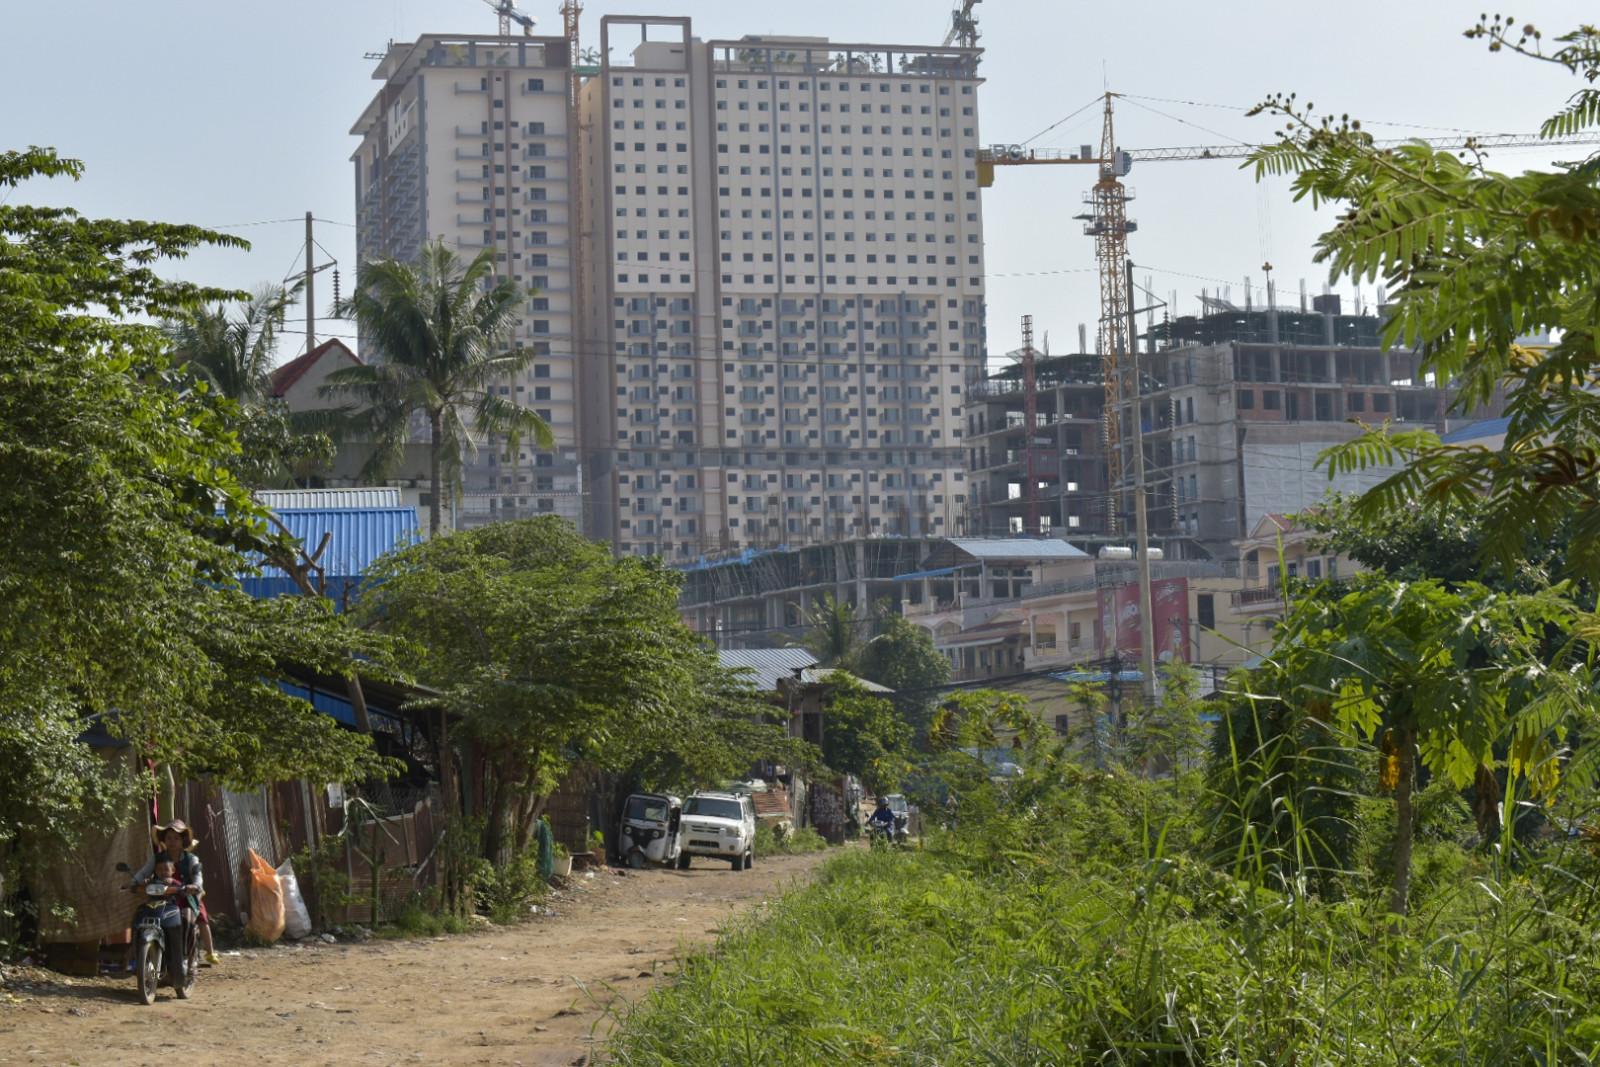 Urban sprawl Phnom Penh